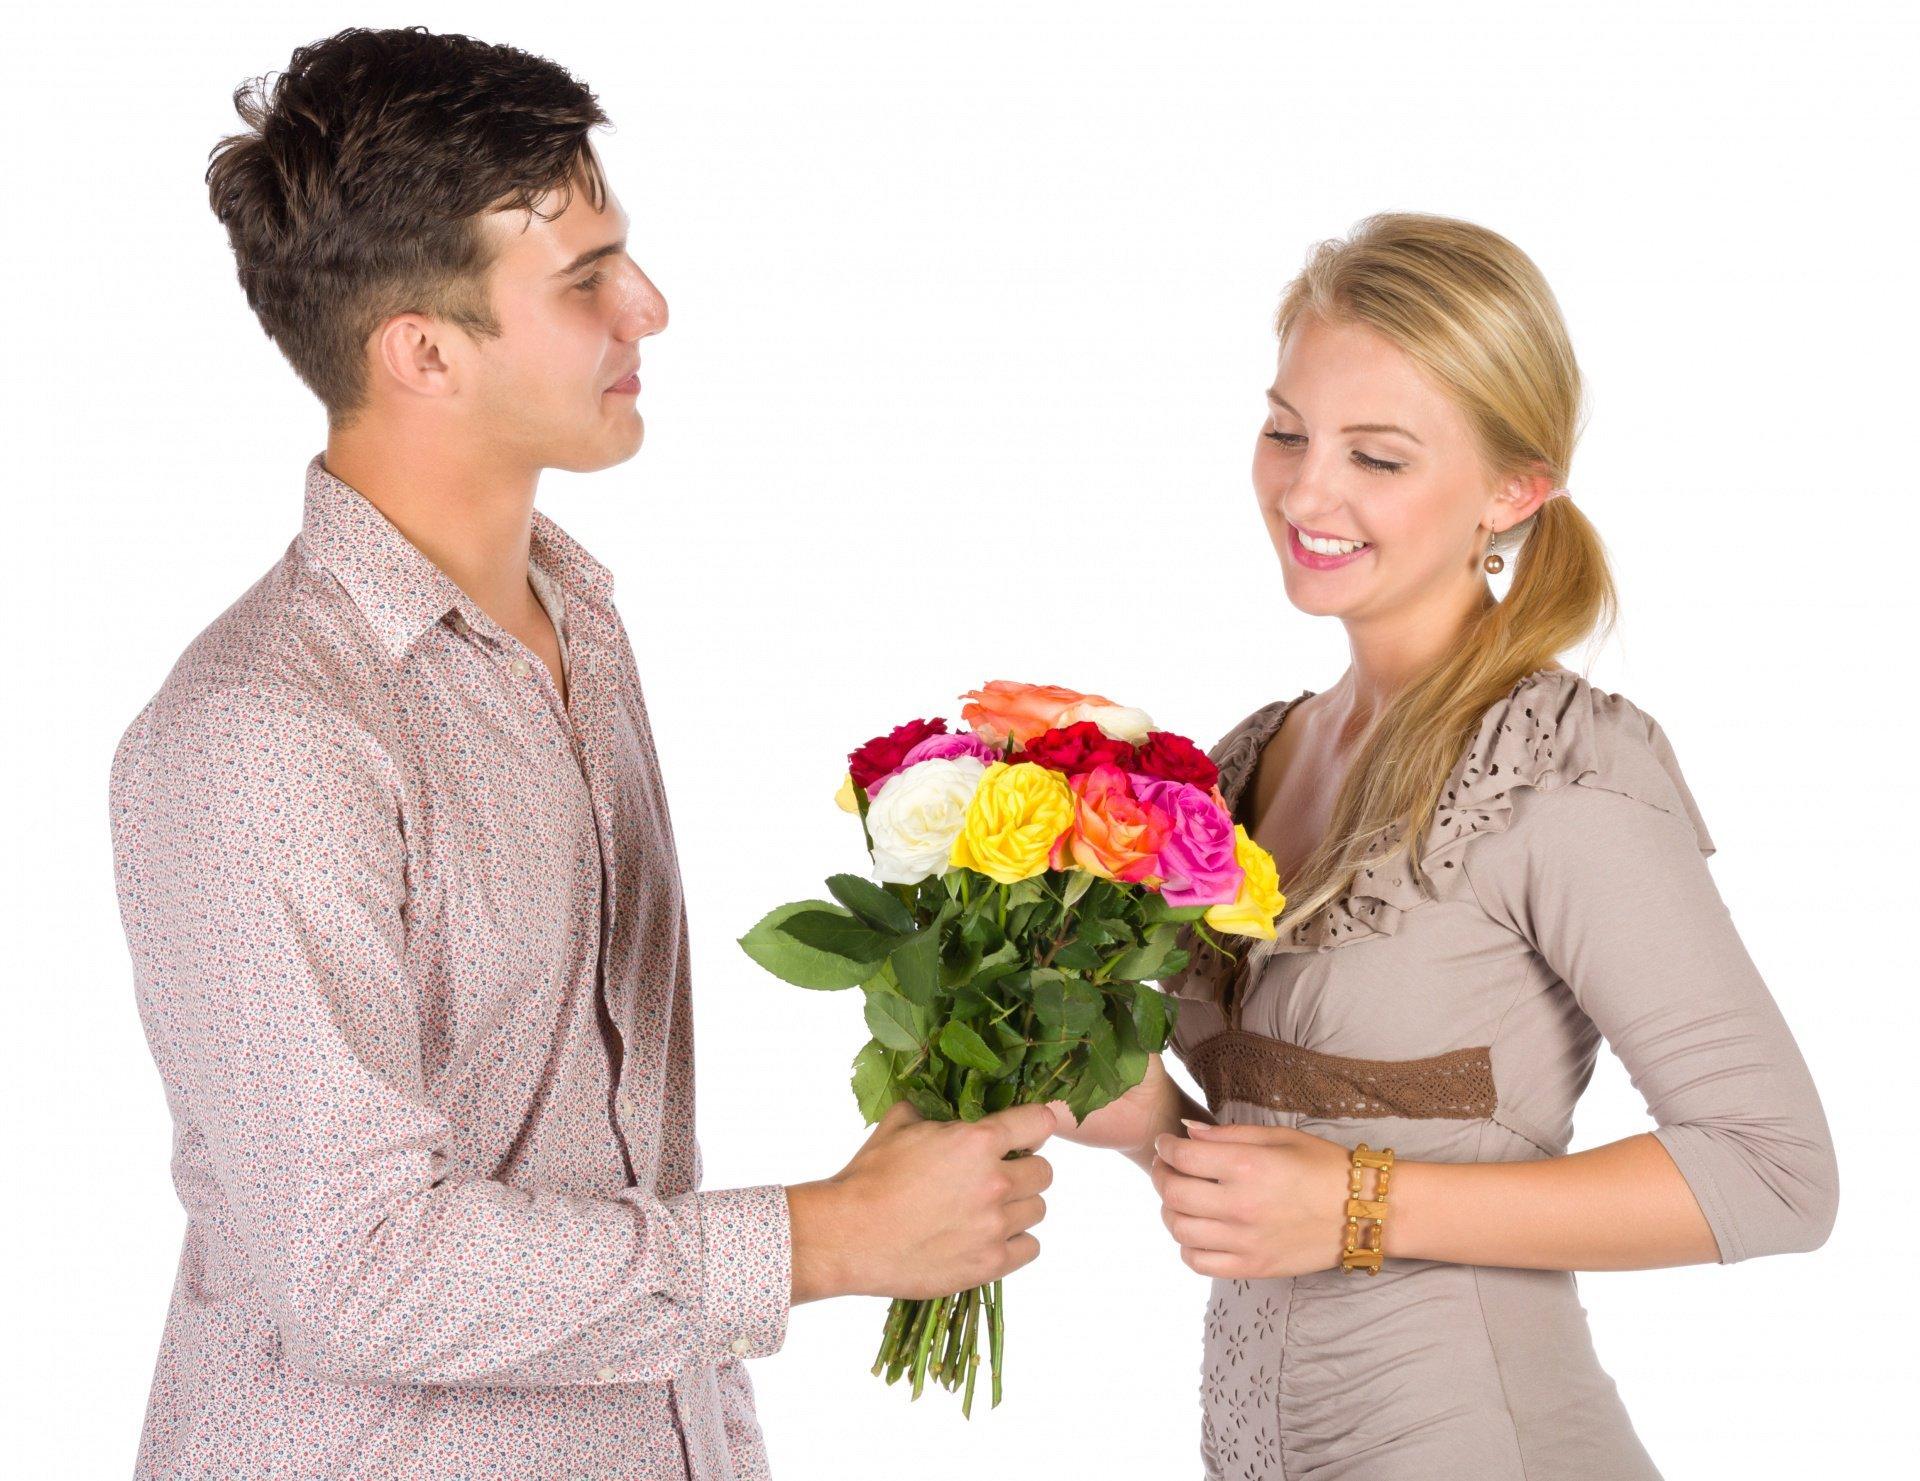 Парень дарит цветы